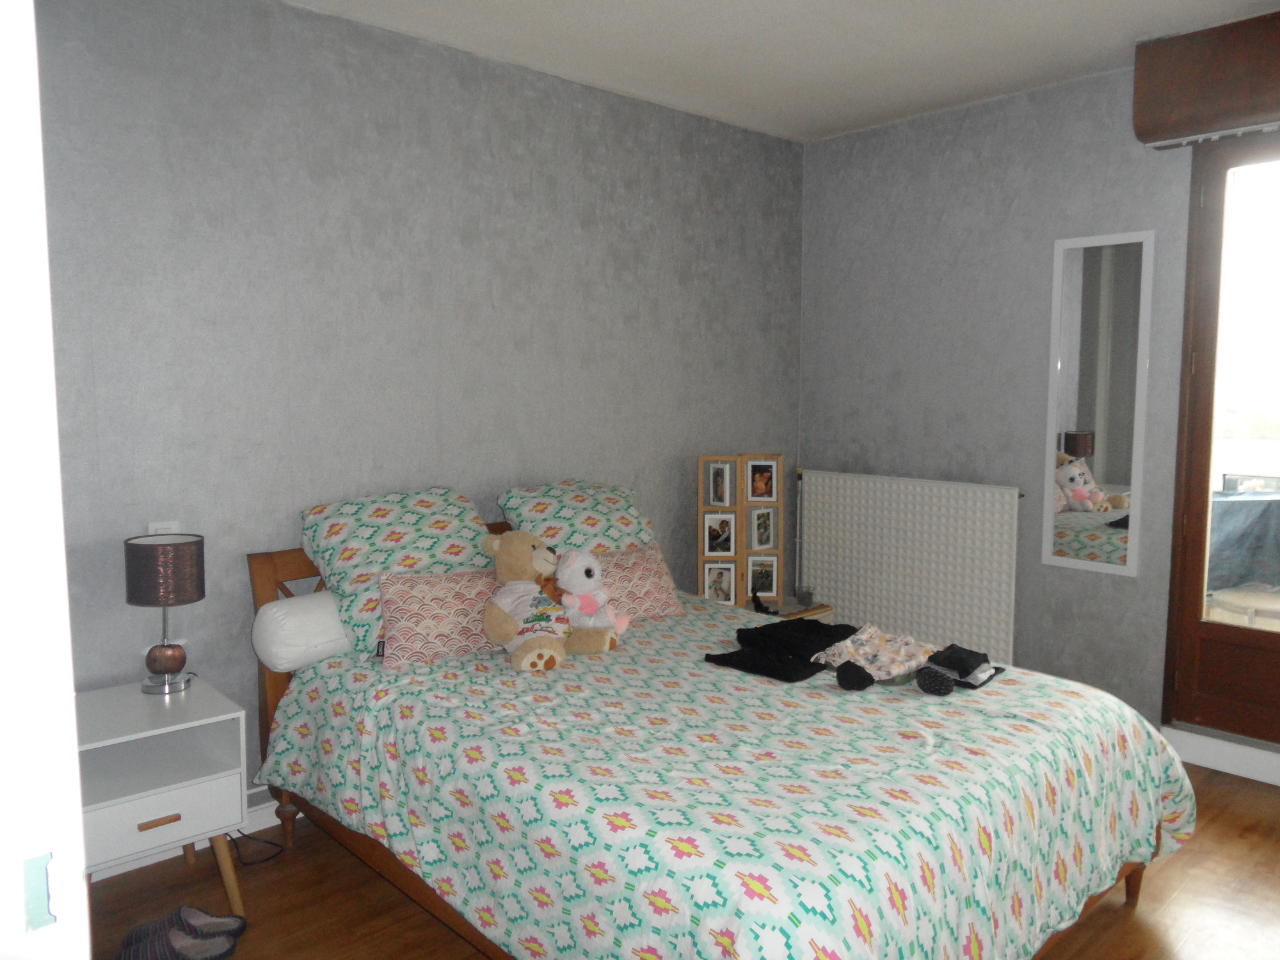 Vente appartement T3  à HENDAYE - 4